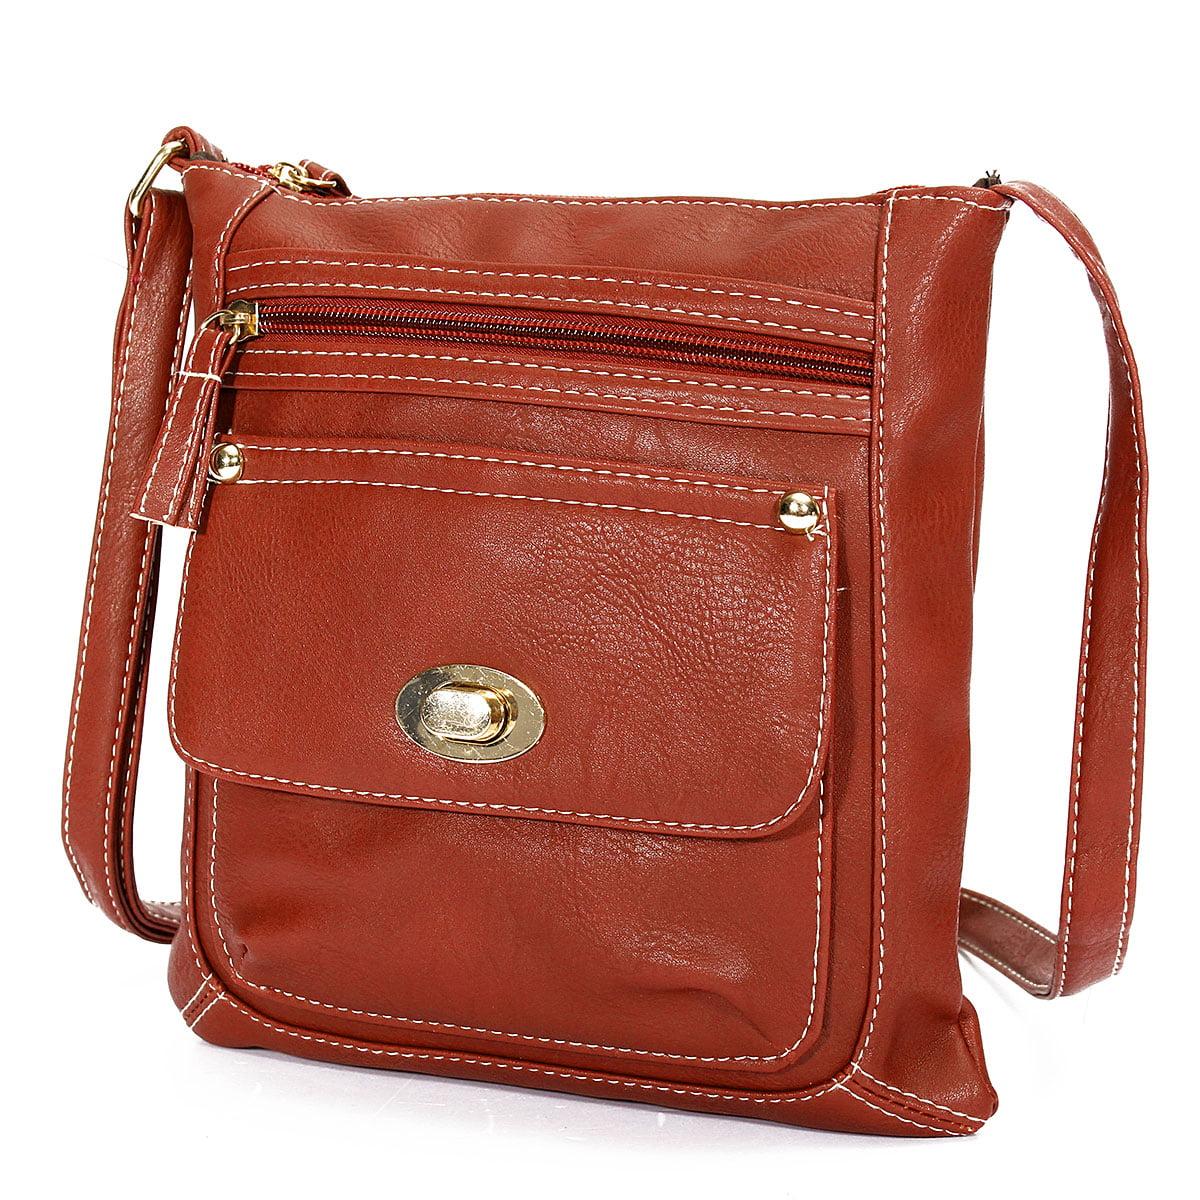 Fashion Shoulder Bag Handbag Crossbody Messenger PU Leather Small Zipper For Women